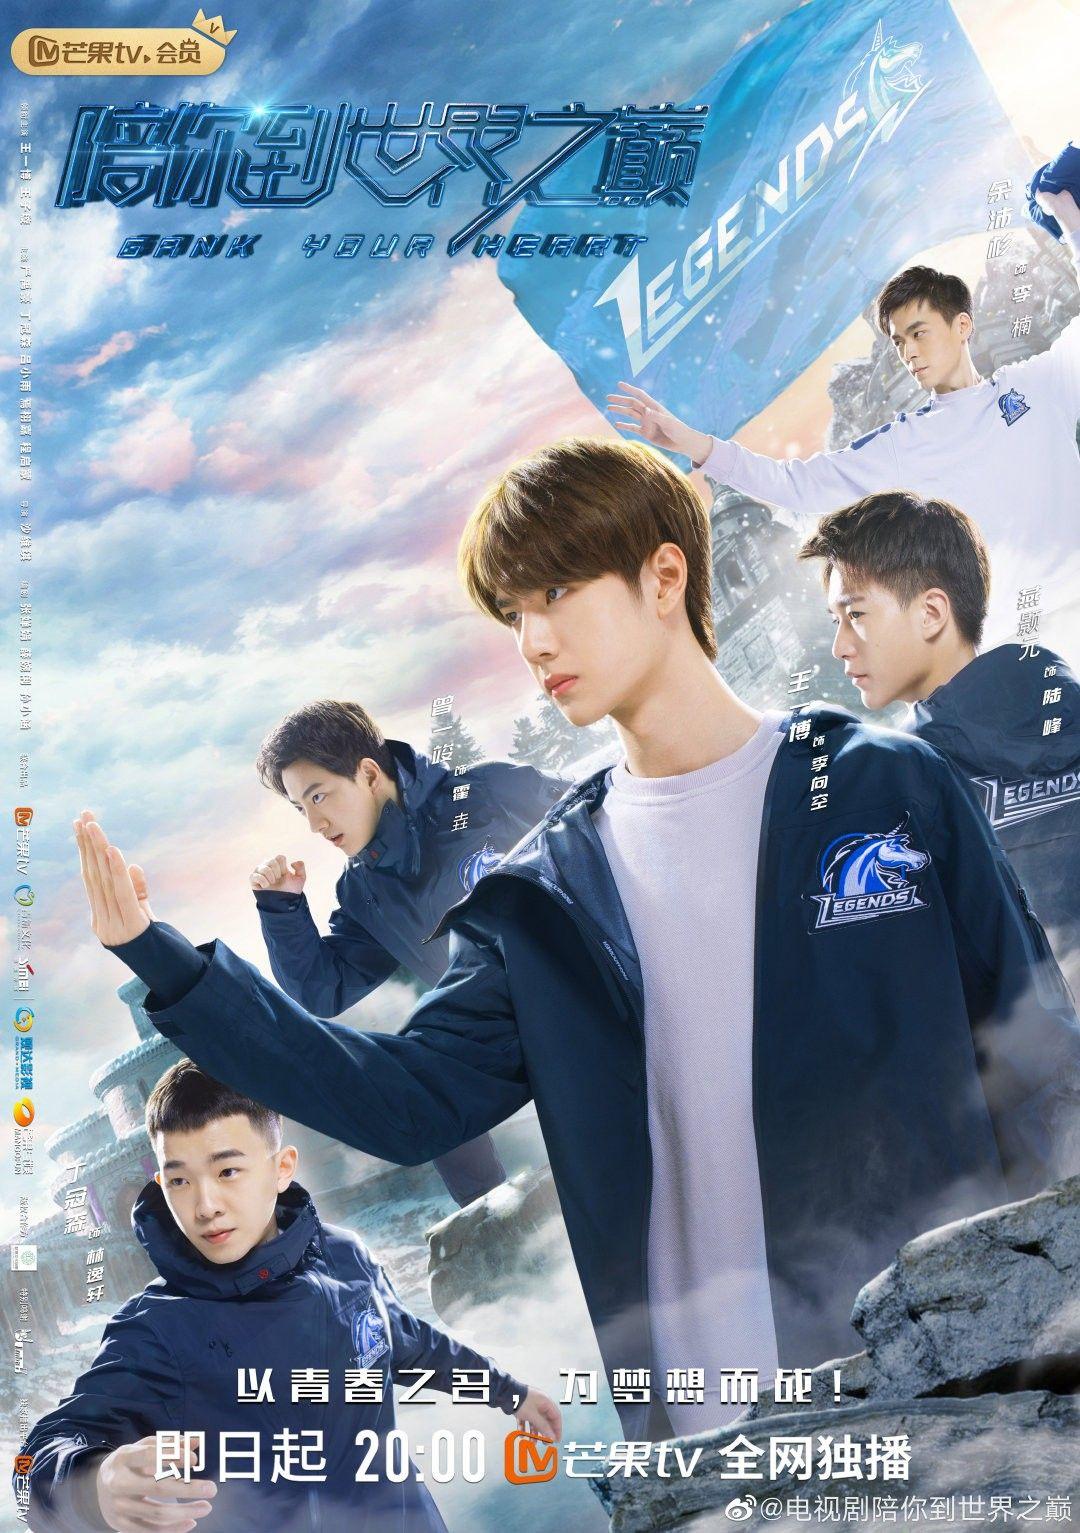 Pin By 93p93 On Uniq Wang Yibo Best Dramas Korean Drama Tv Korean Drama Movies